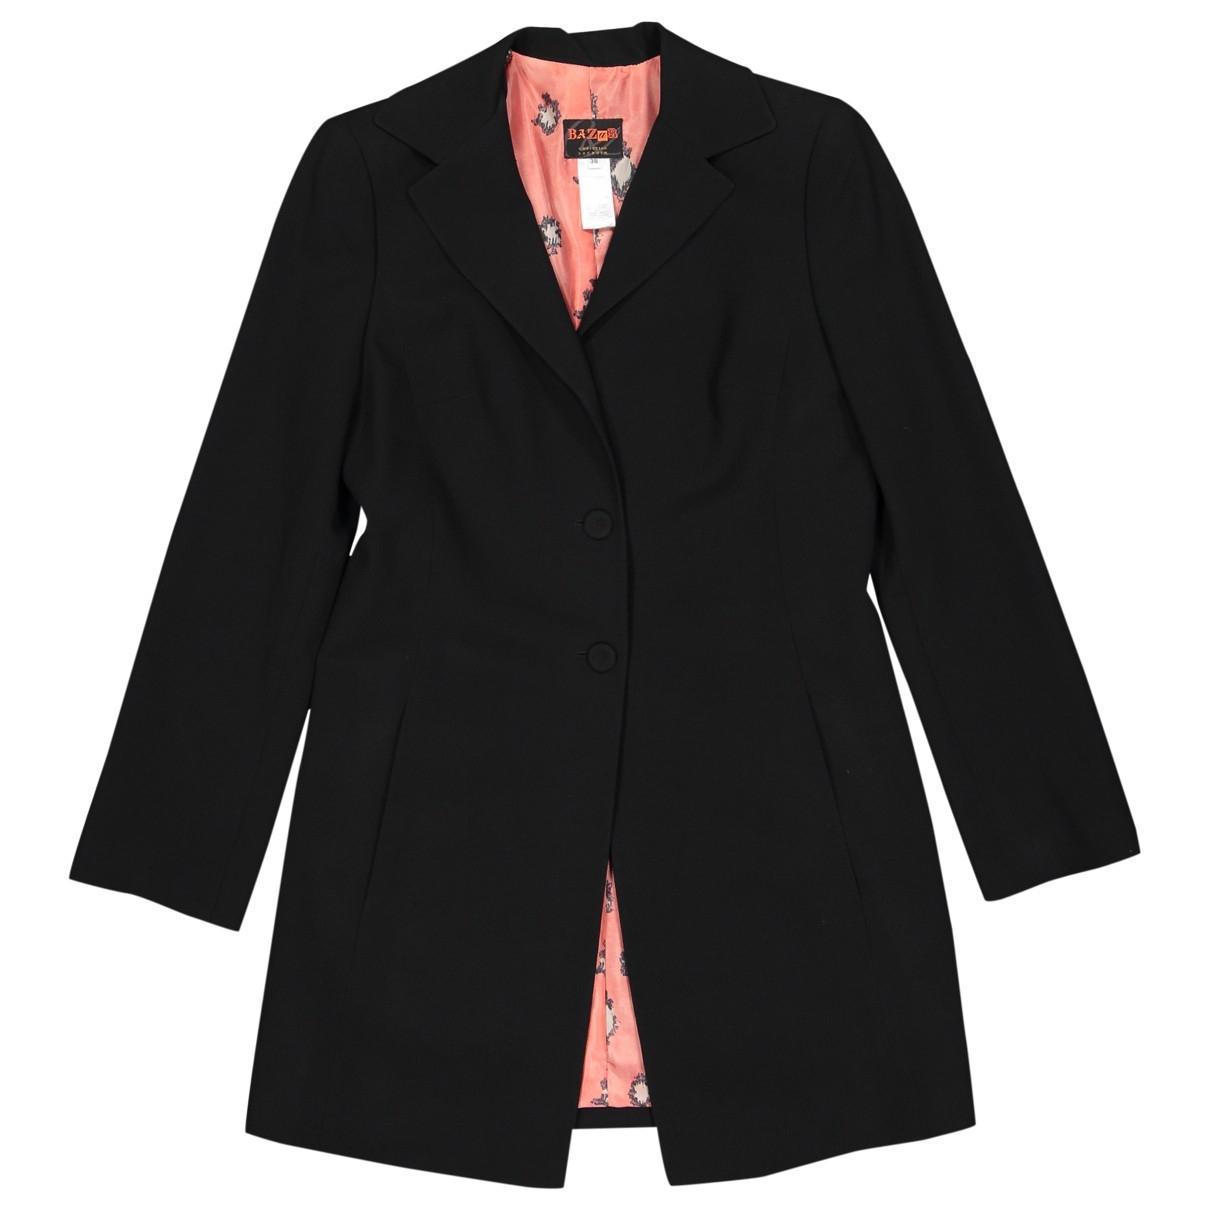 Christian Lacroix \N Black jacket for Women 38 FR